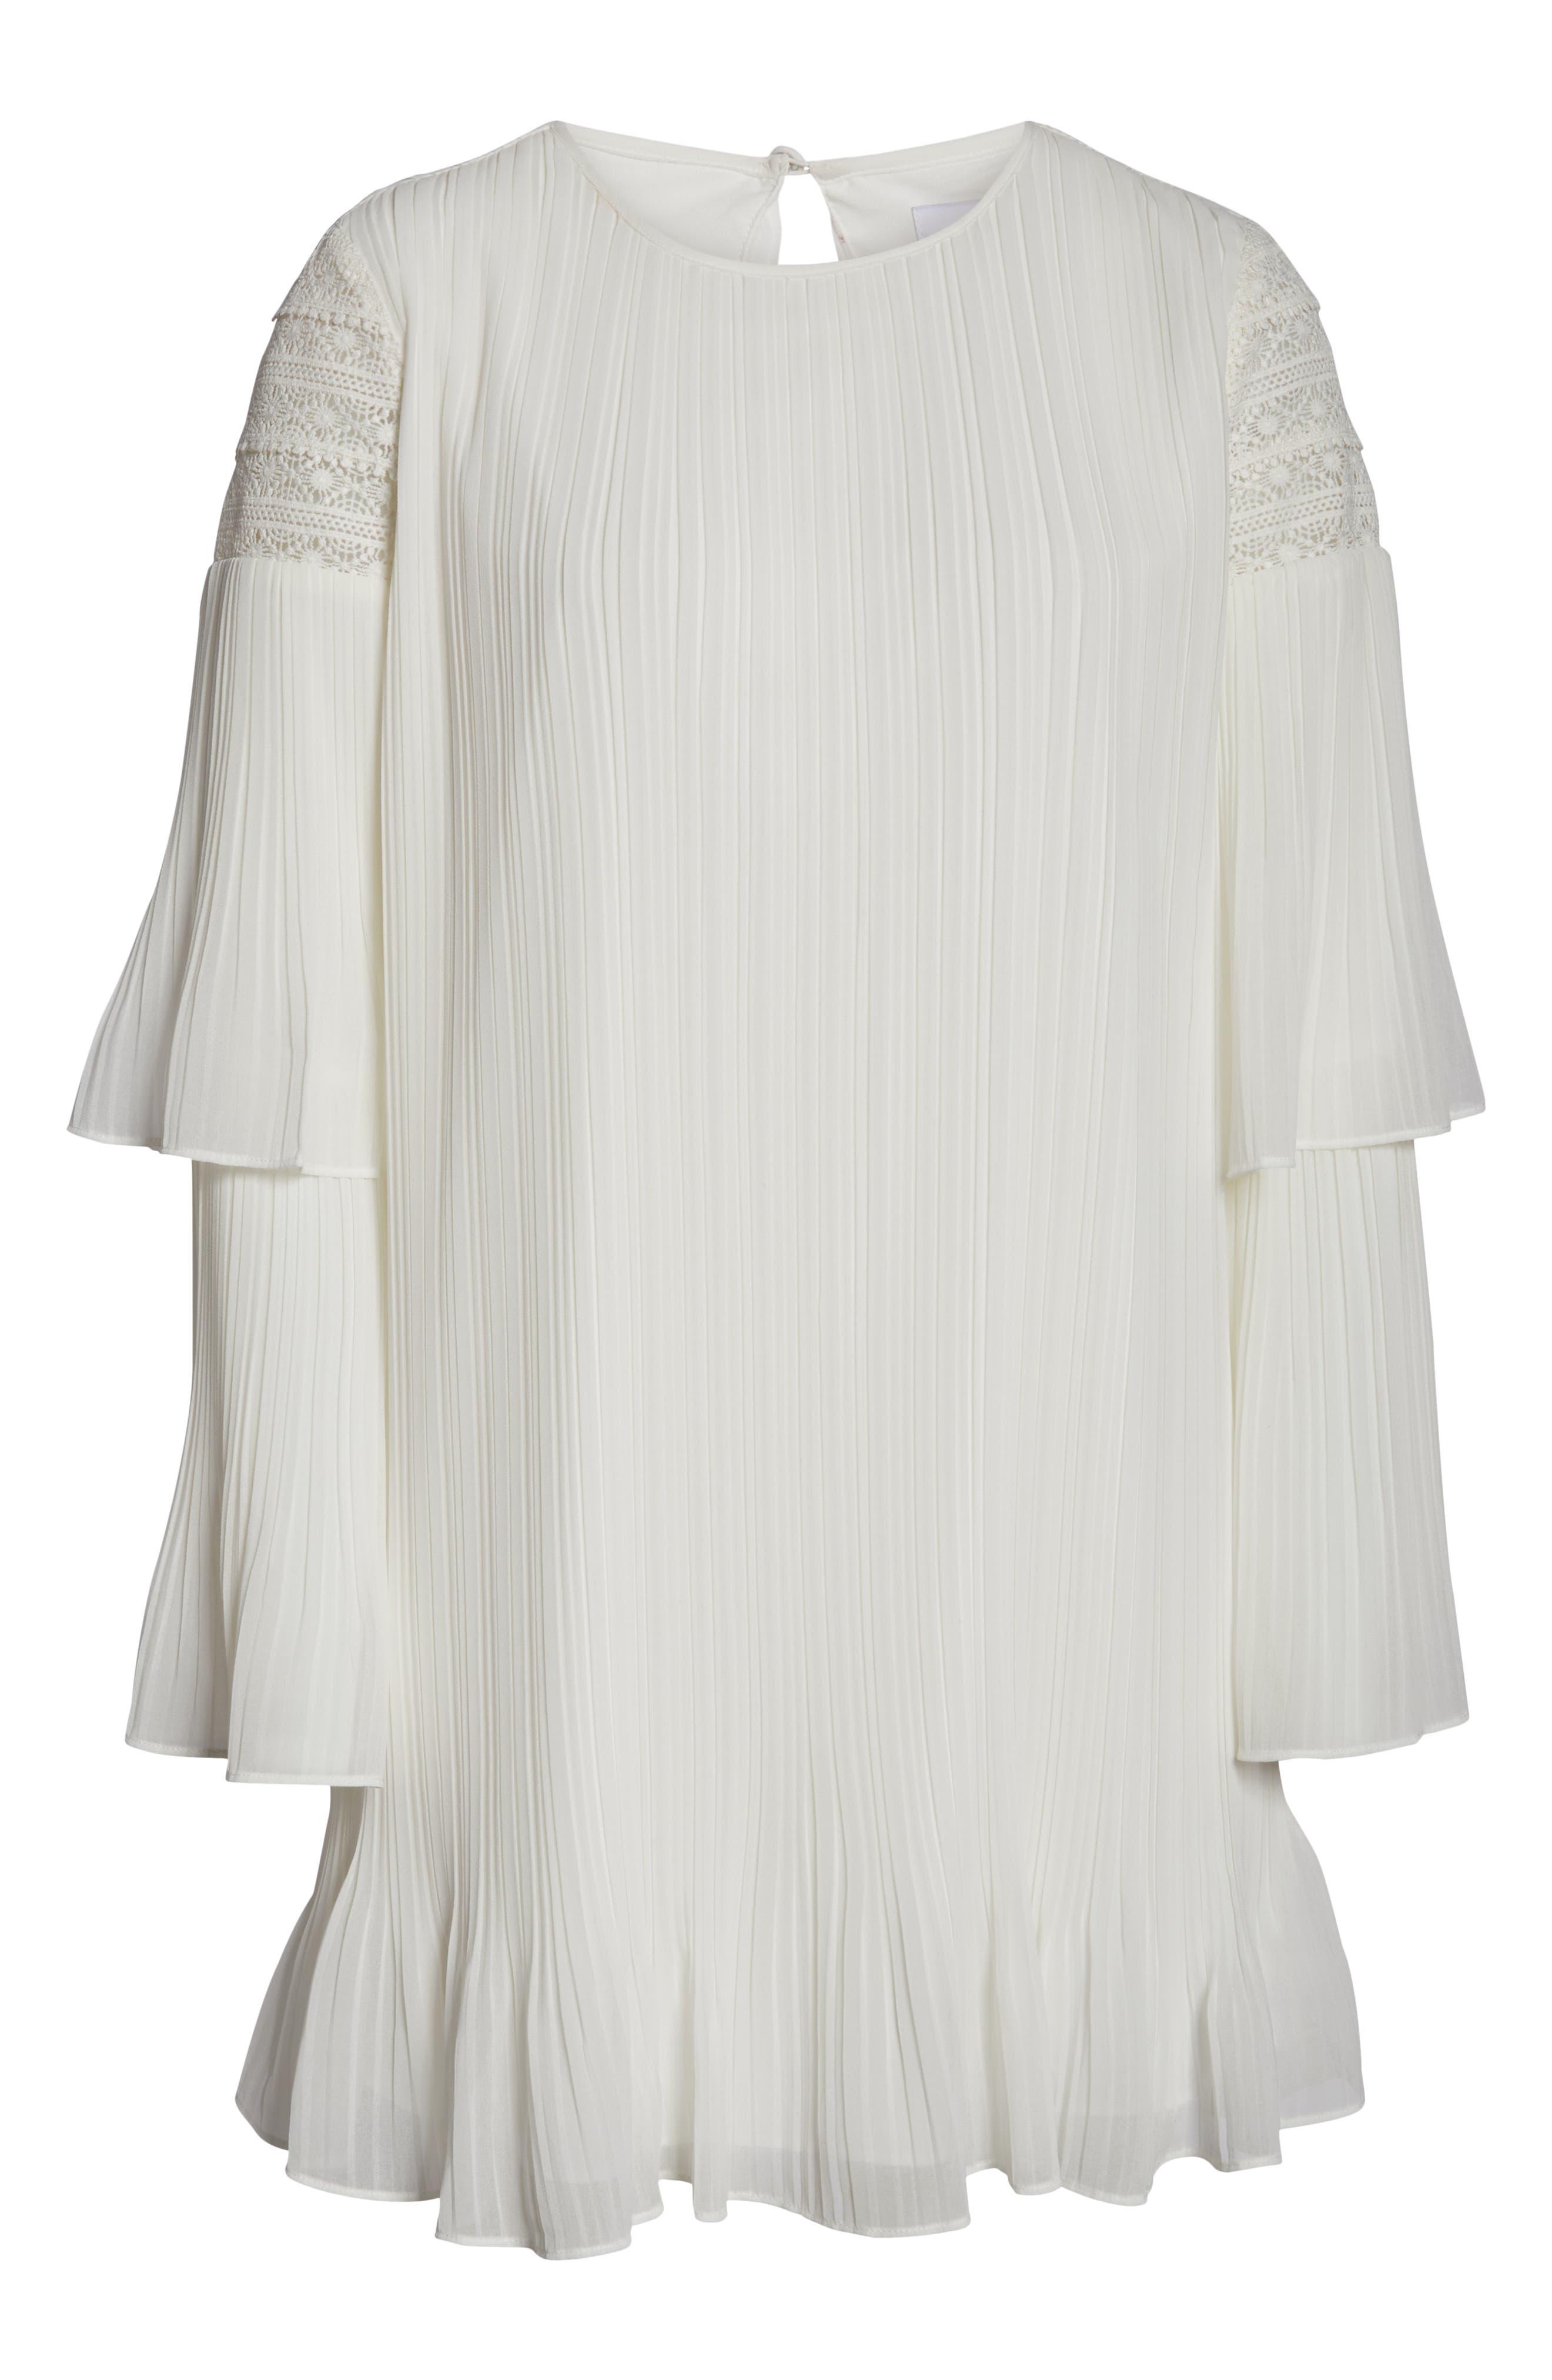 ALI & JAY, Waterlily Pleated Minidress, Alternate thumbnail 7, color, WHITE